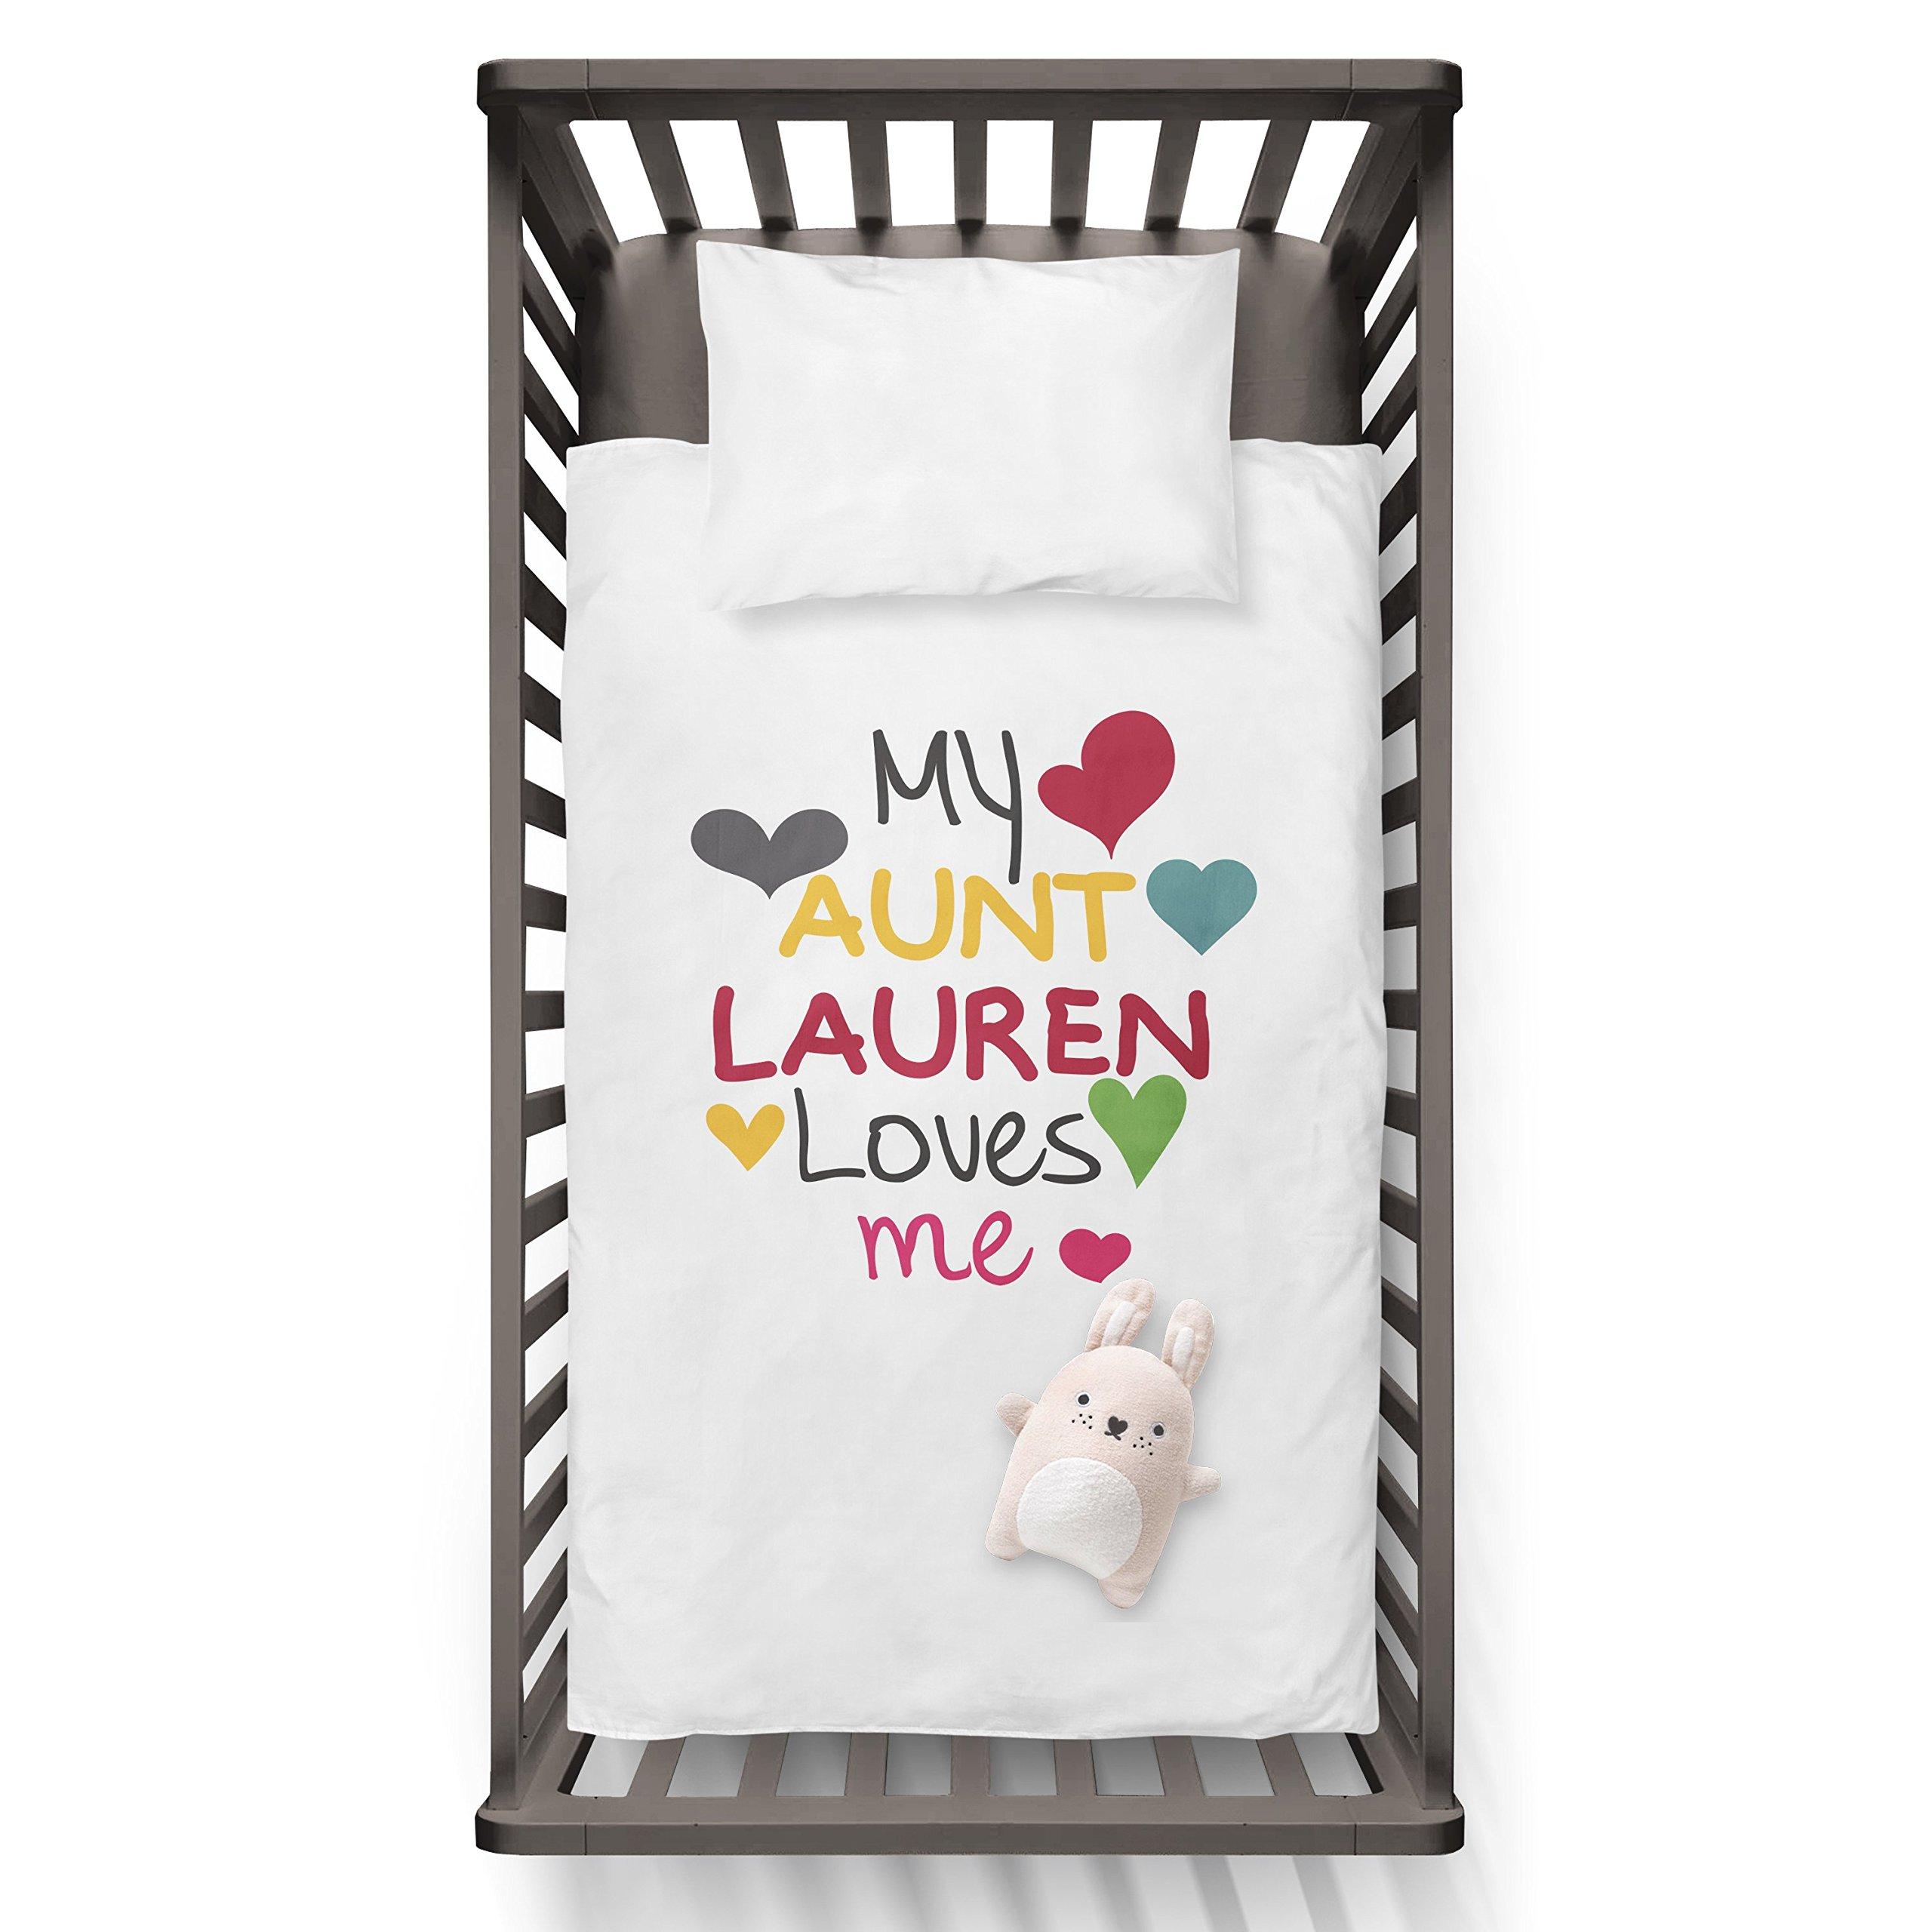 My Aunt Lauren (any name) Loves My Funny Humor Hip Baby Duvet /Pillow set,Toddler Duvet,Oeko-Tex,Personalized duvet and pillow,Oraganic,gift